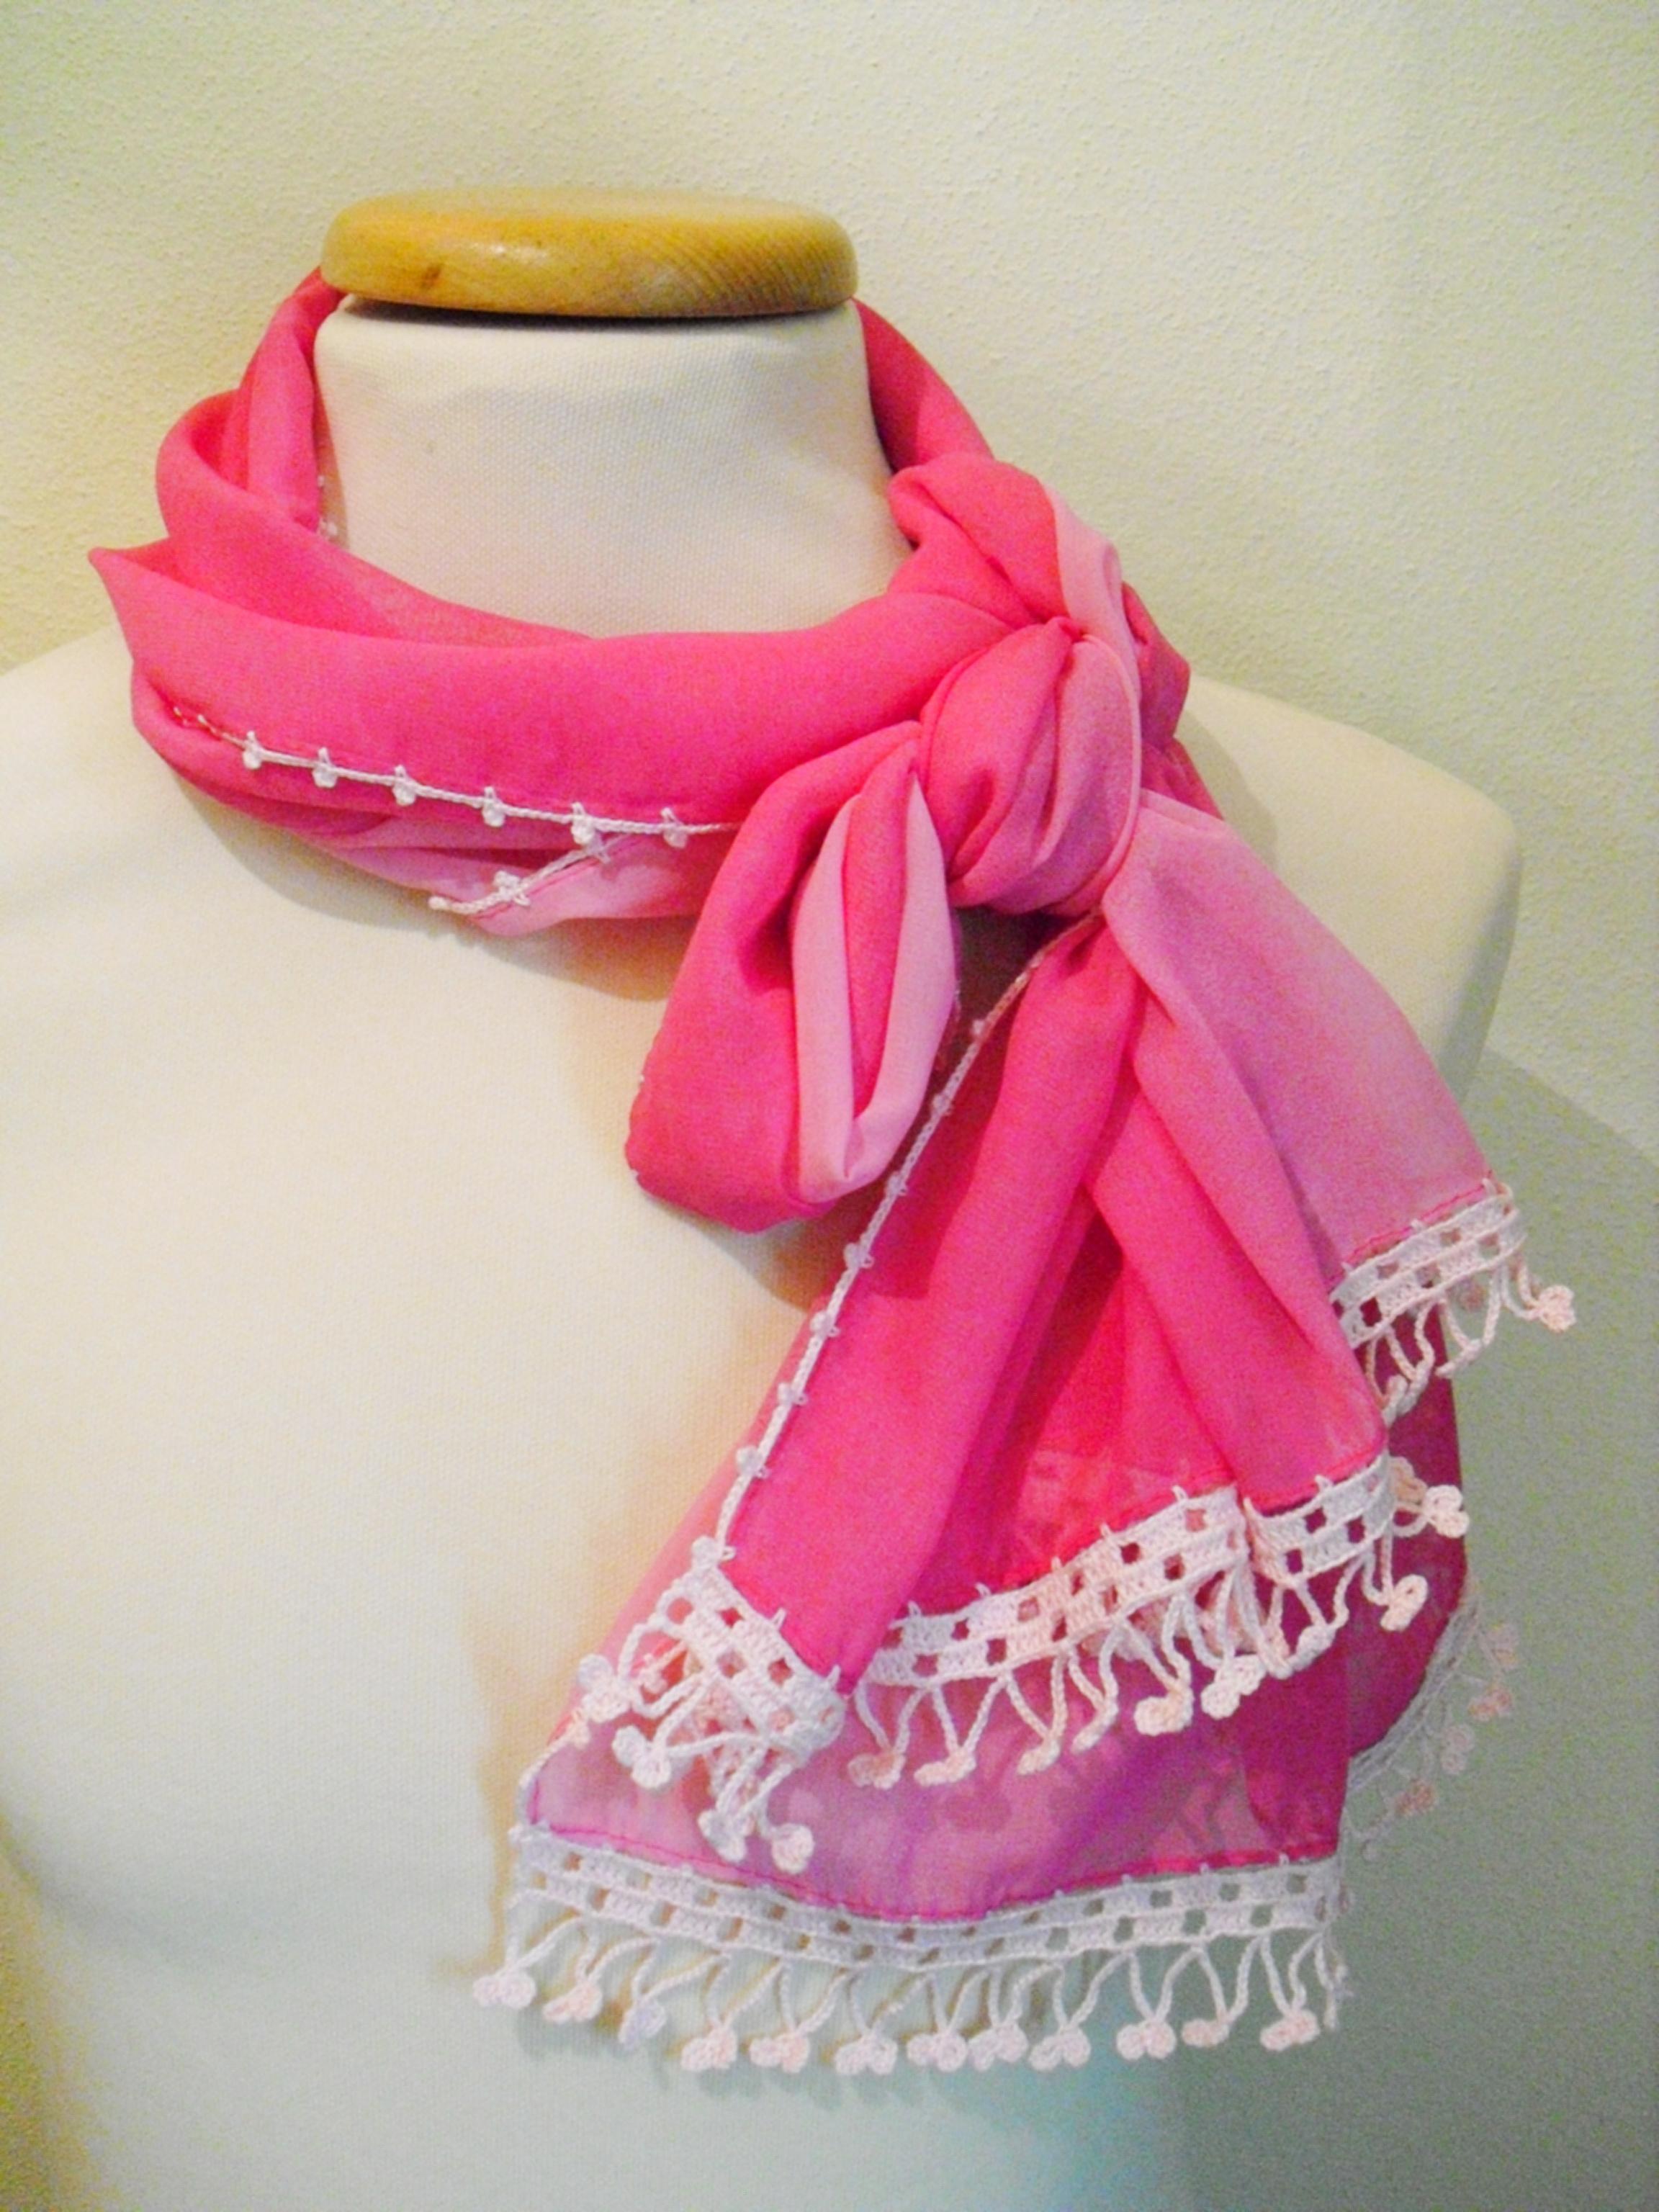 Écharpe rosa, costumizada com crochet